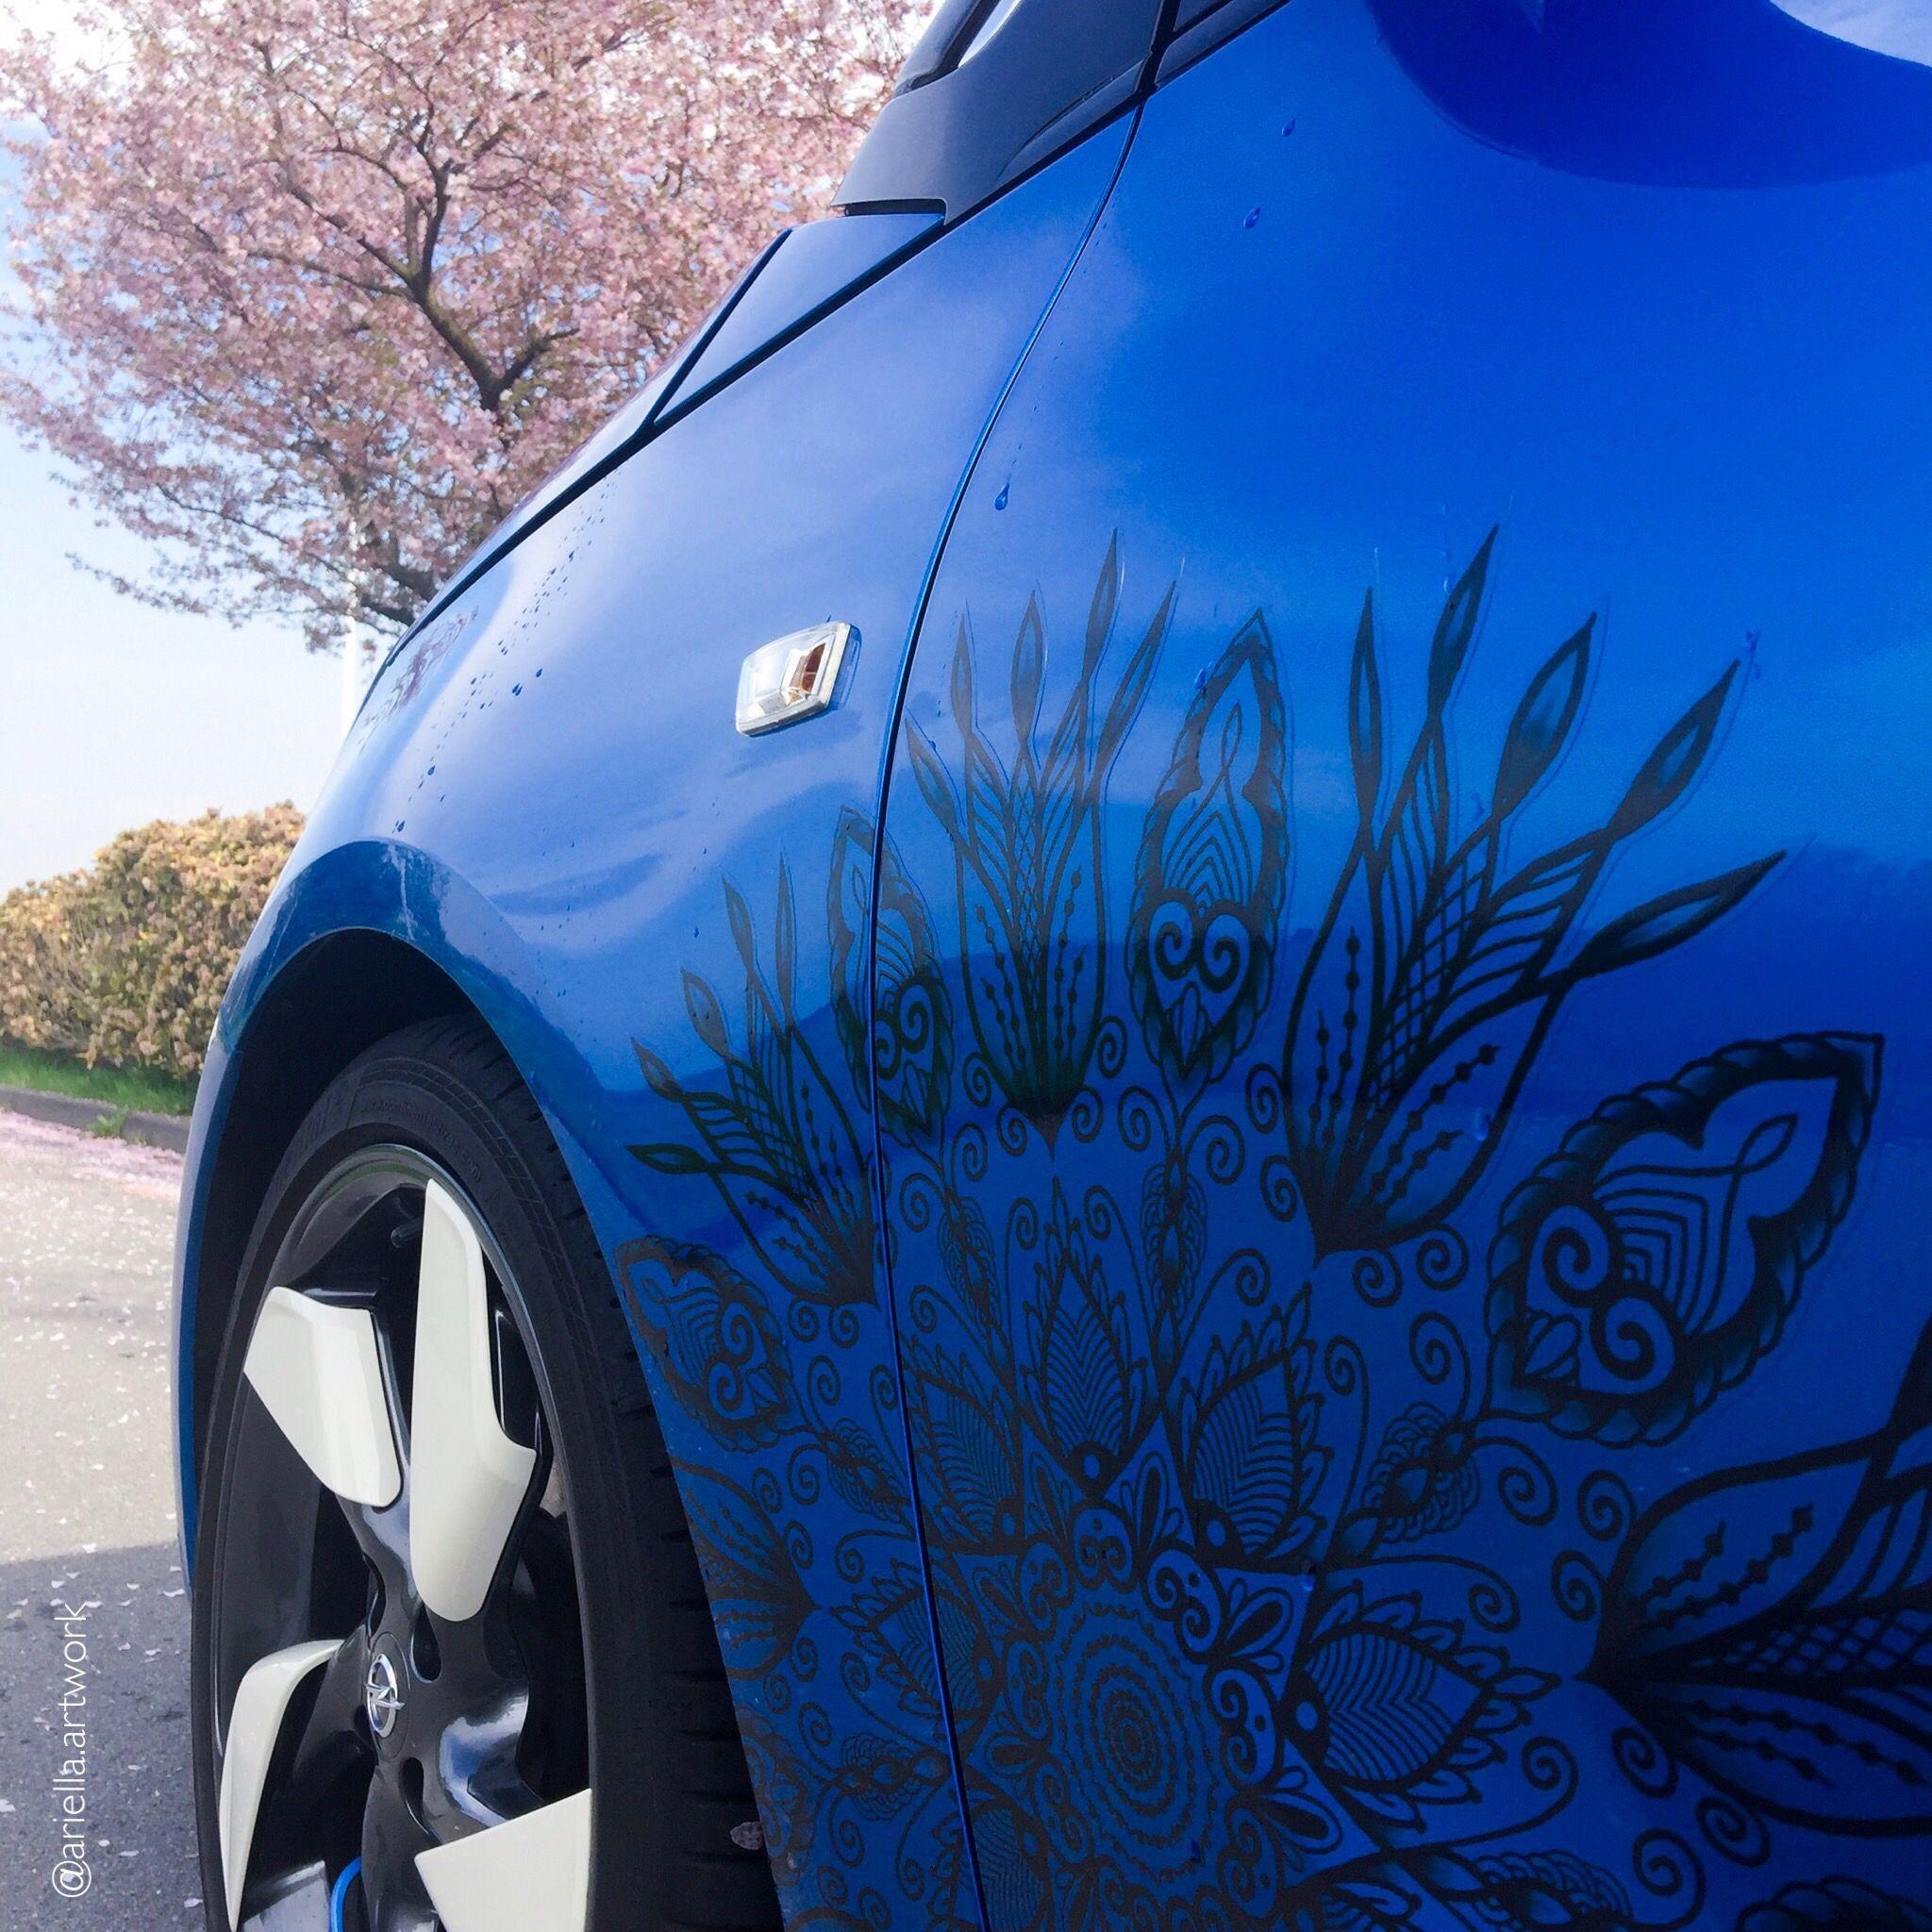 Mandala Sticker Aufkleber Speziell Für Autos Car Mandala